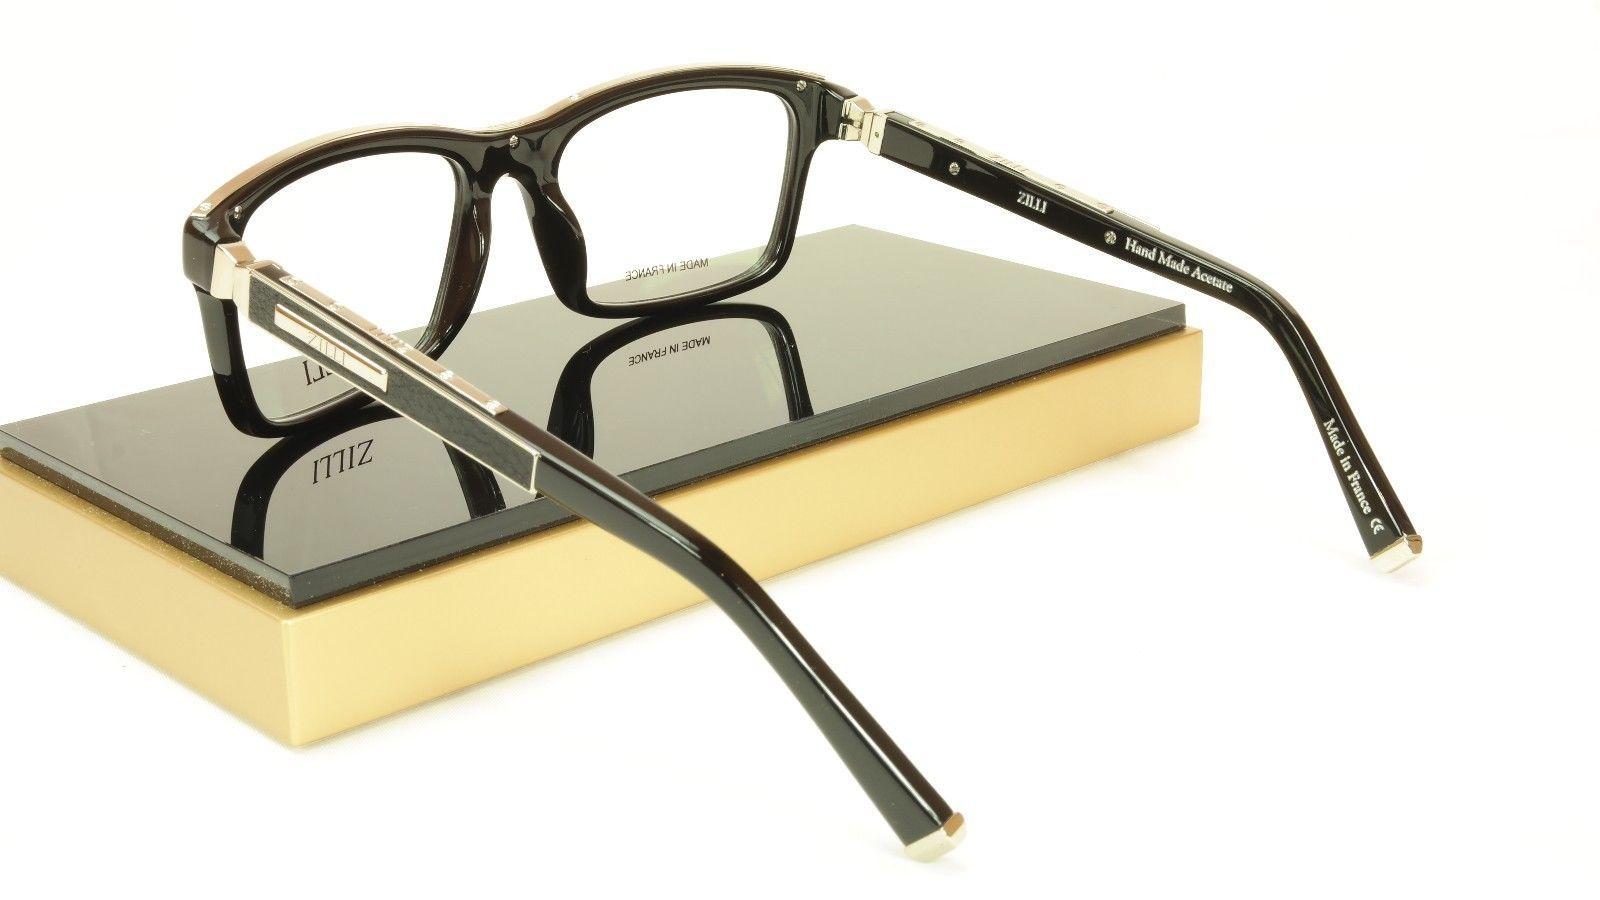 2c5965b497f ZILLI Eyeglasses Frame Acetate Leather Titanium France Hand Made ZI 60001  C03